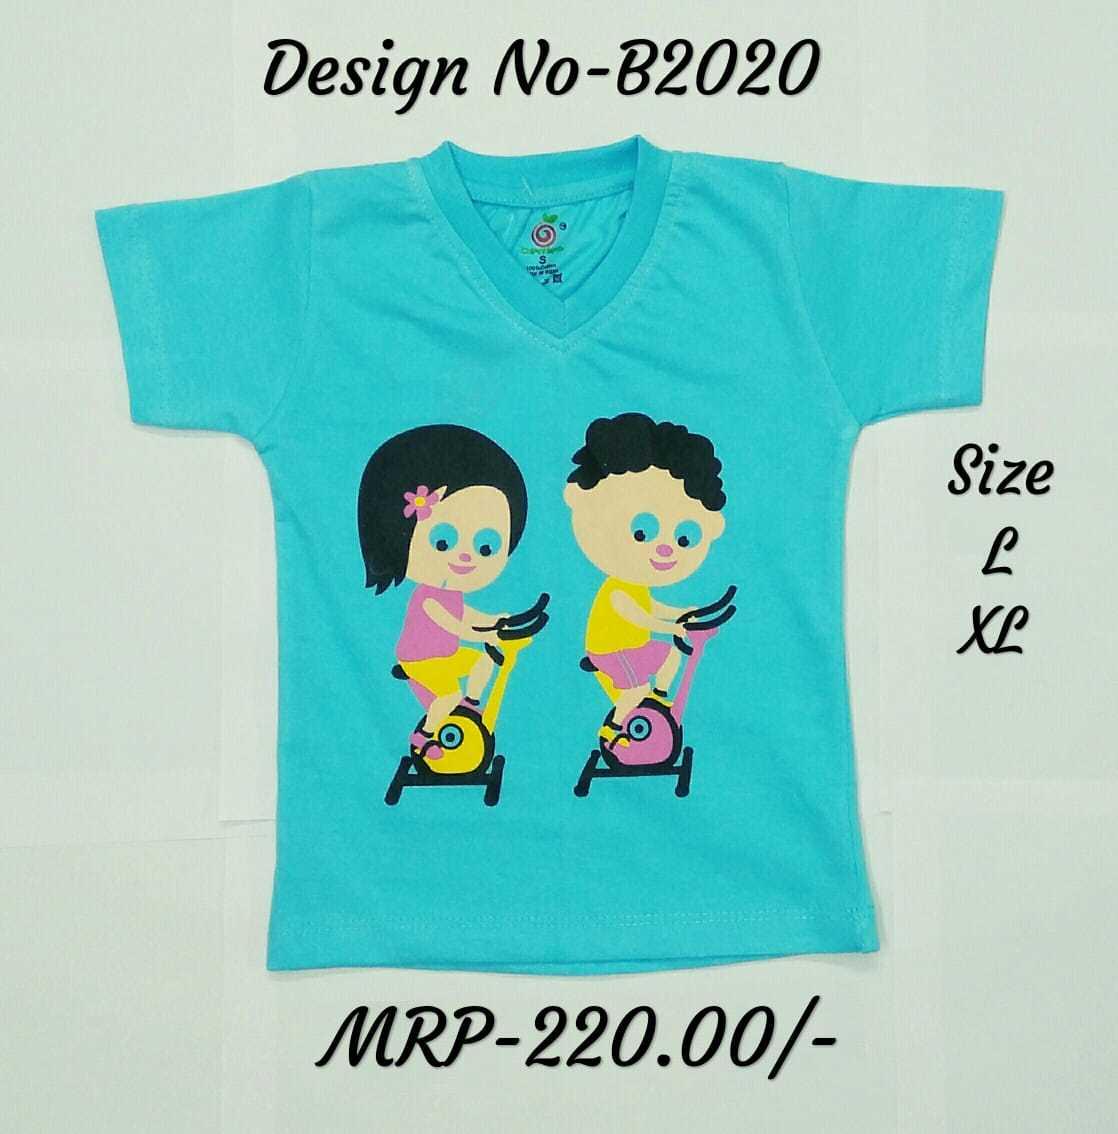 ebe2f156 Kids Boy Girl Design Print T Shirts L Blue Pink Yellow V Neck